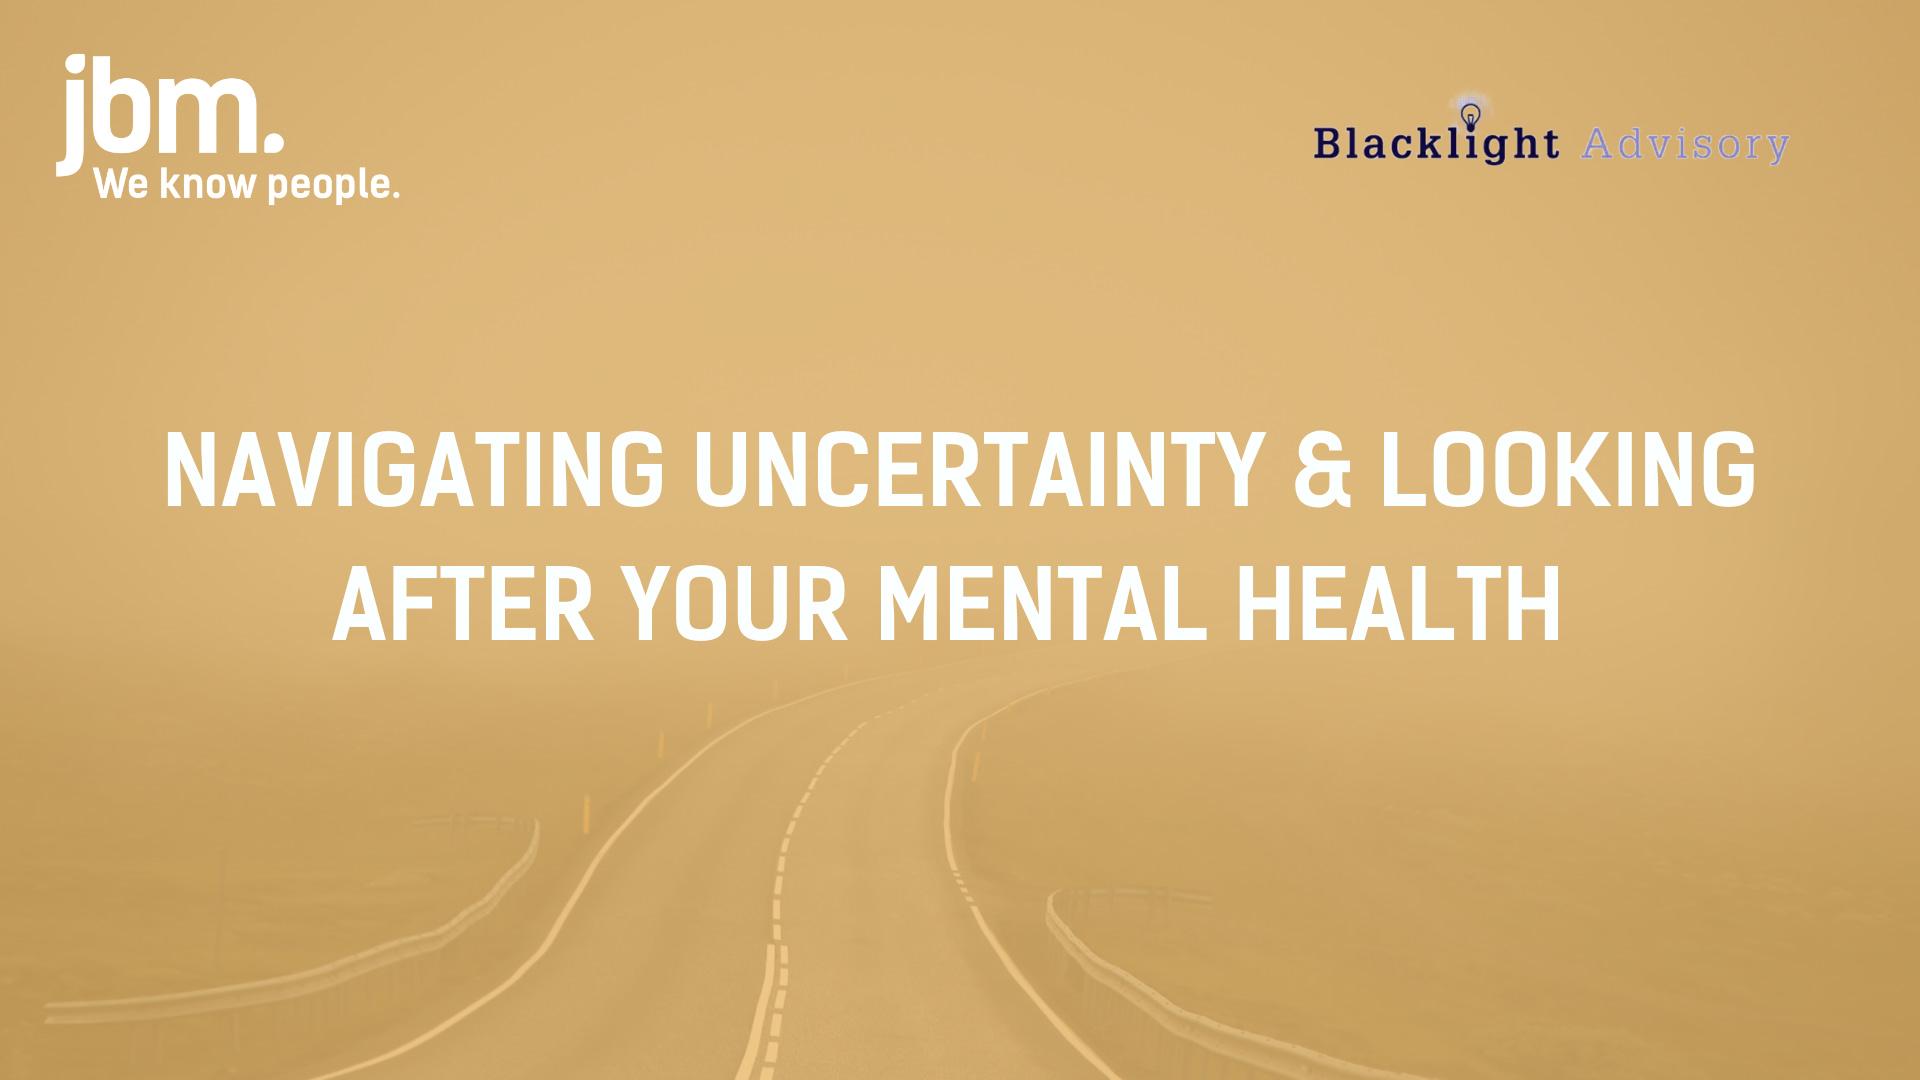 Navigating uncertainty webinar